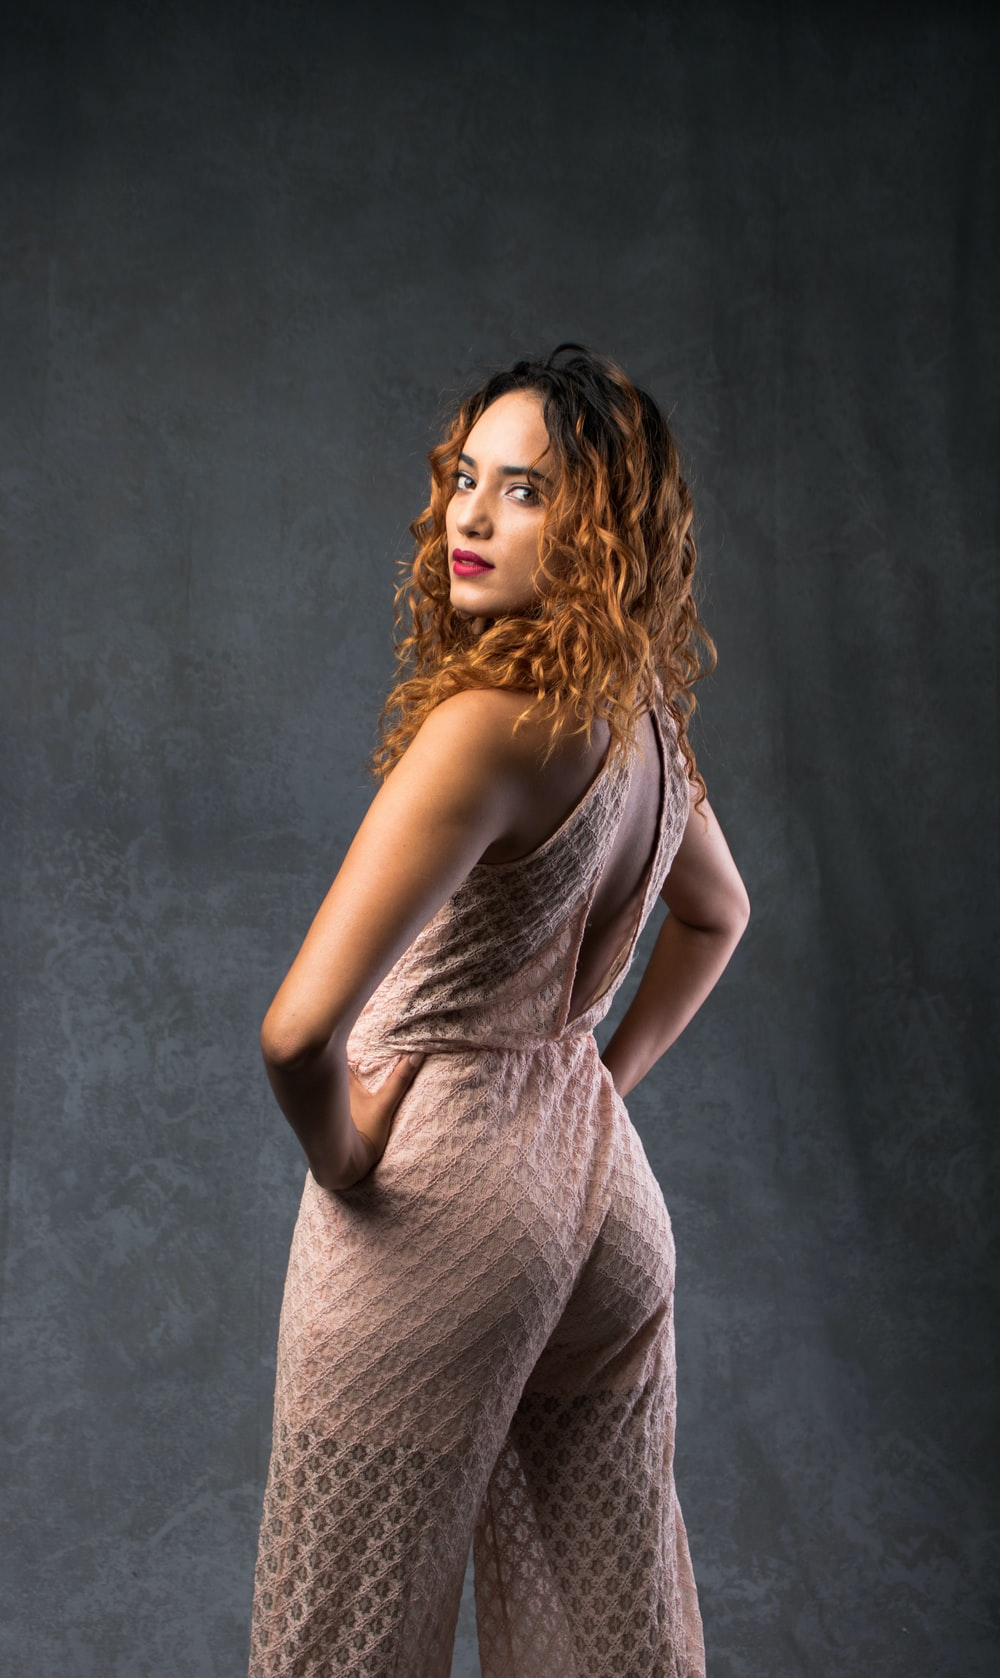 woman posing near black curtains